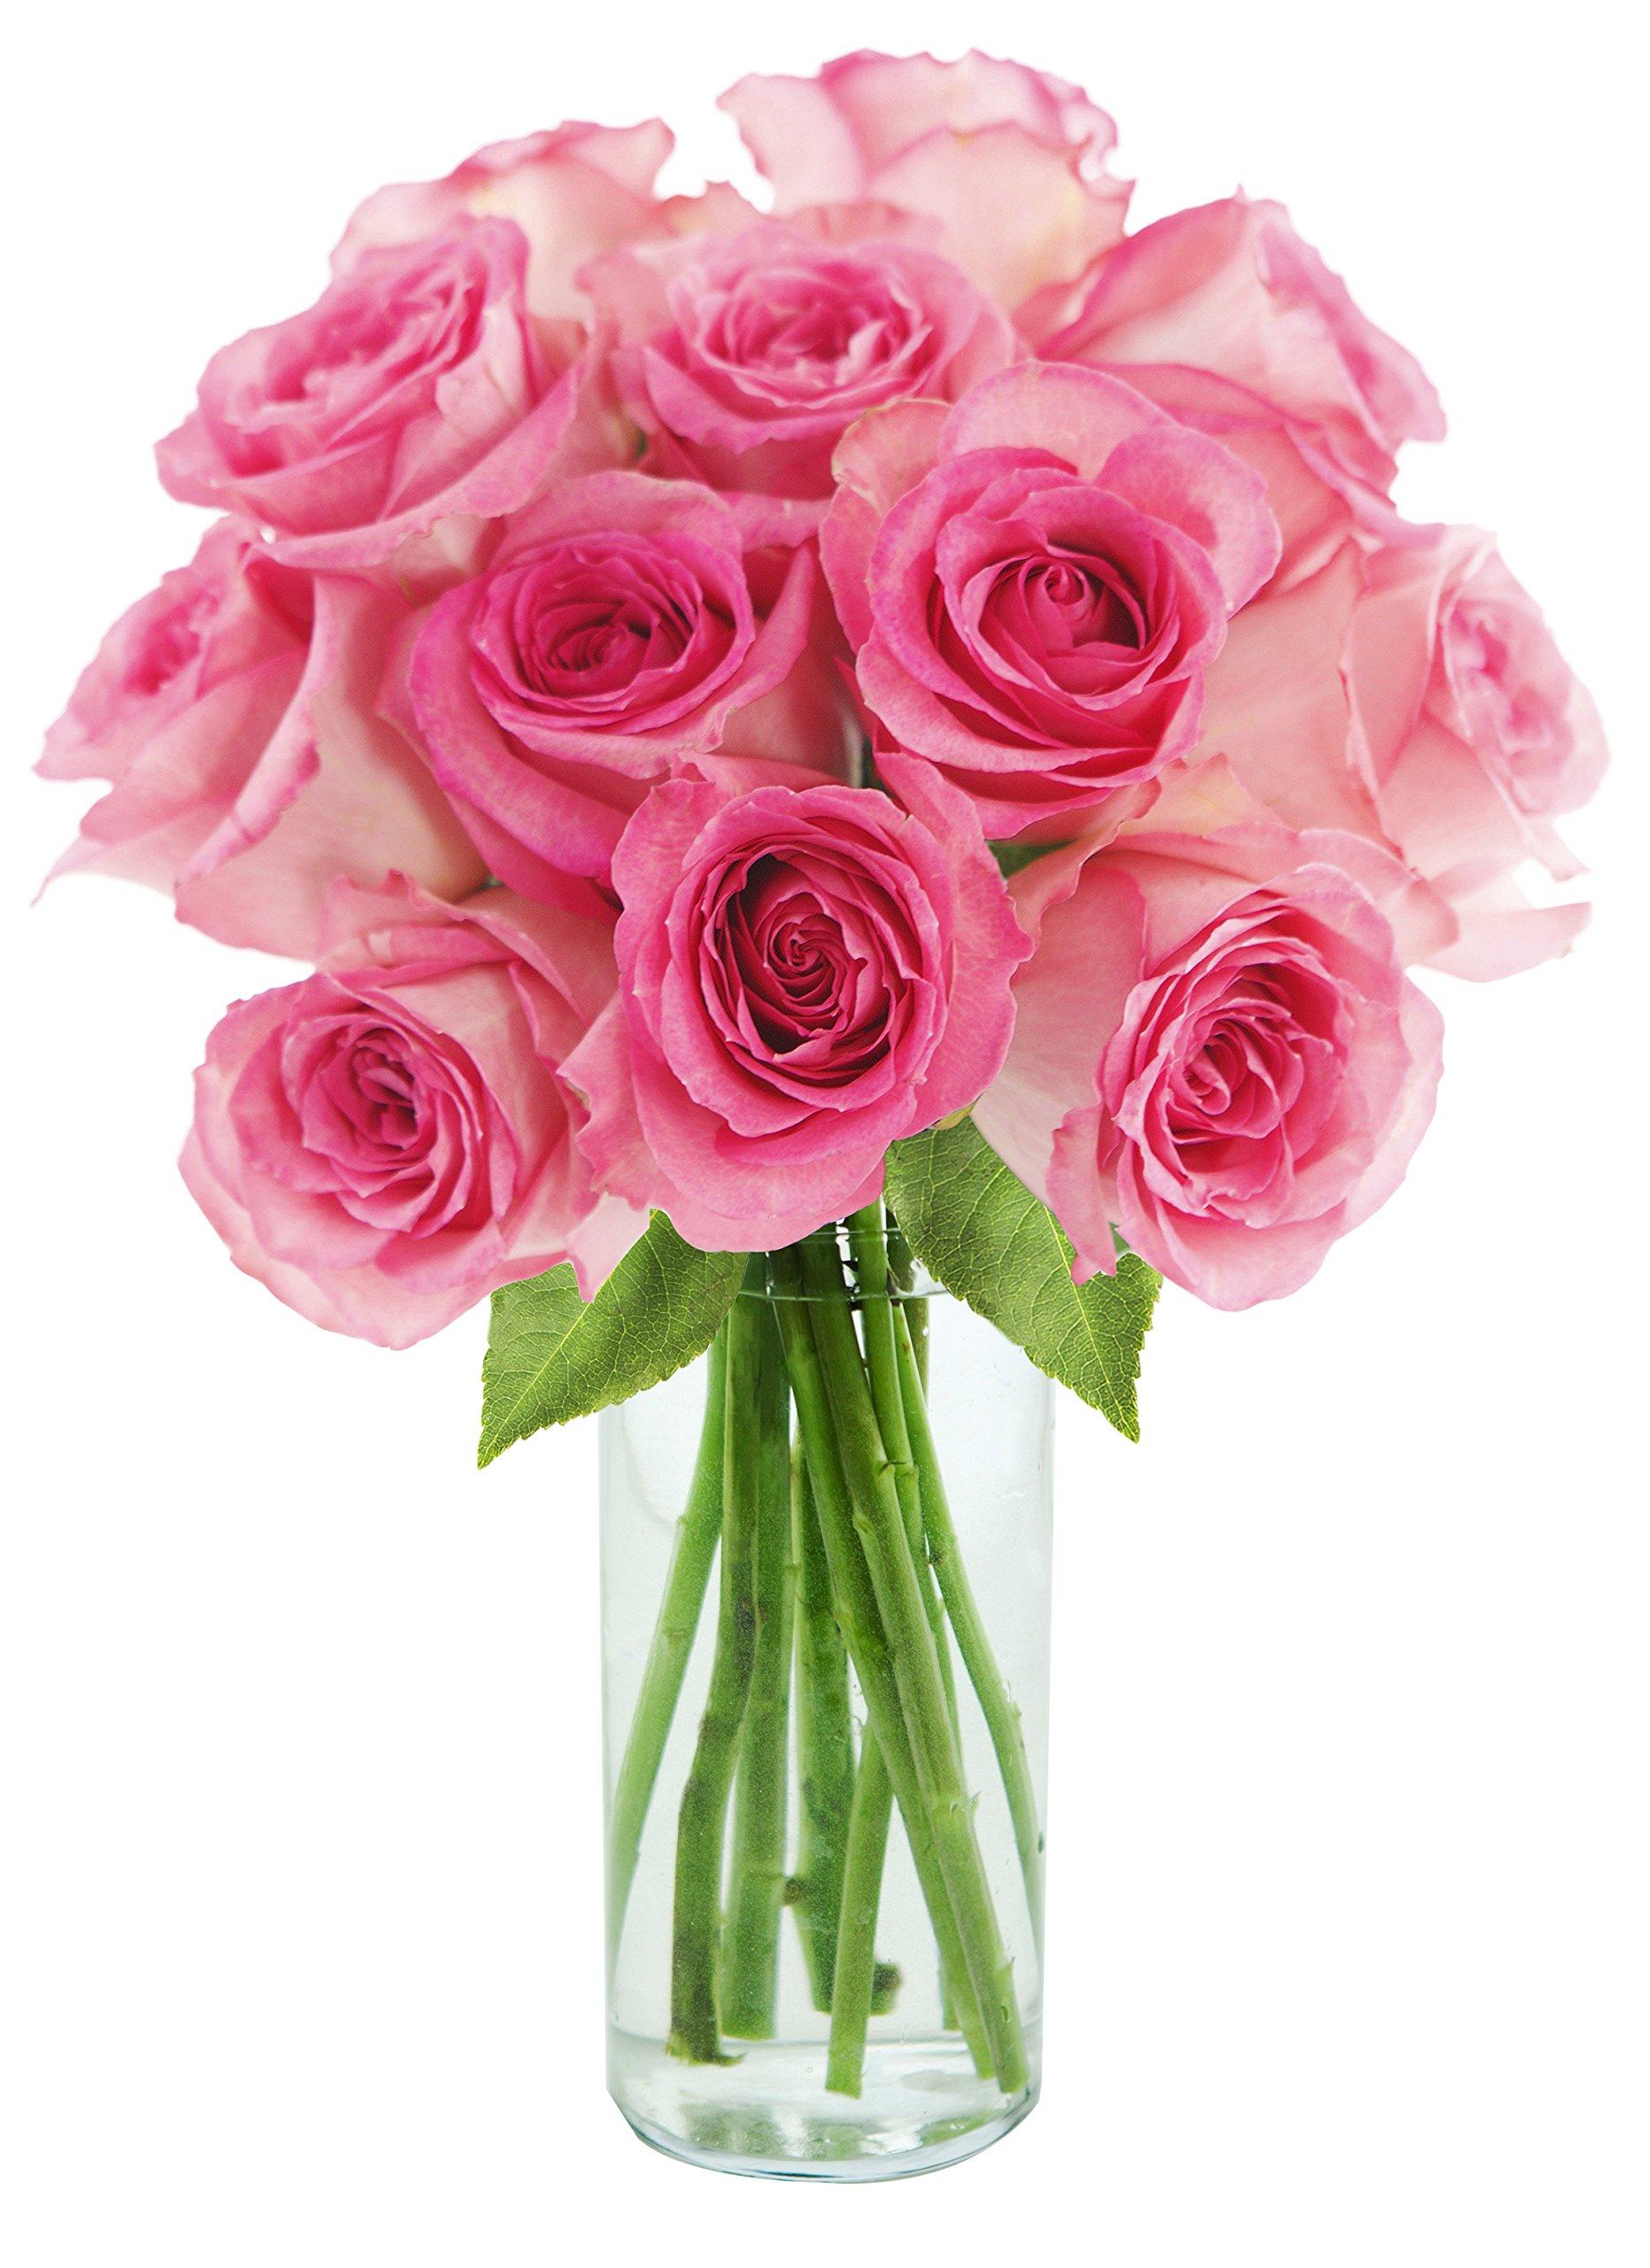 Amazon.com : KaBloom Romantic Red Rose Bouquet: 12 Fresh ...